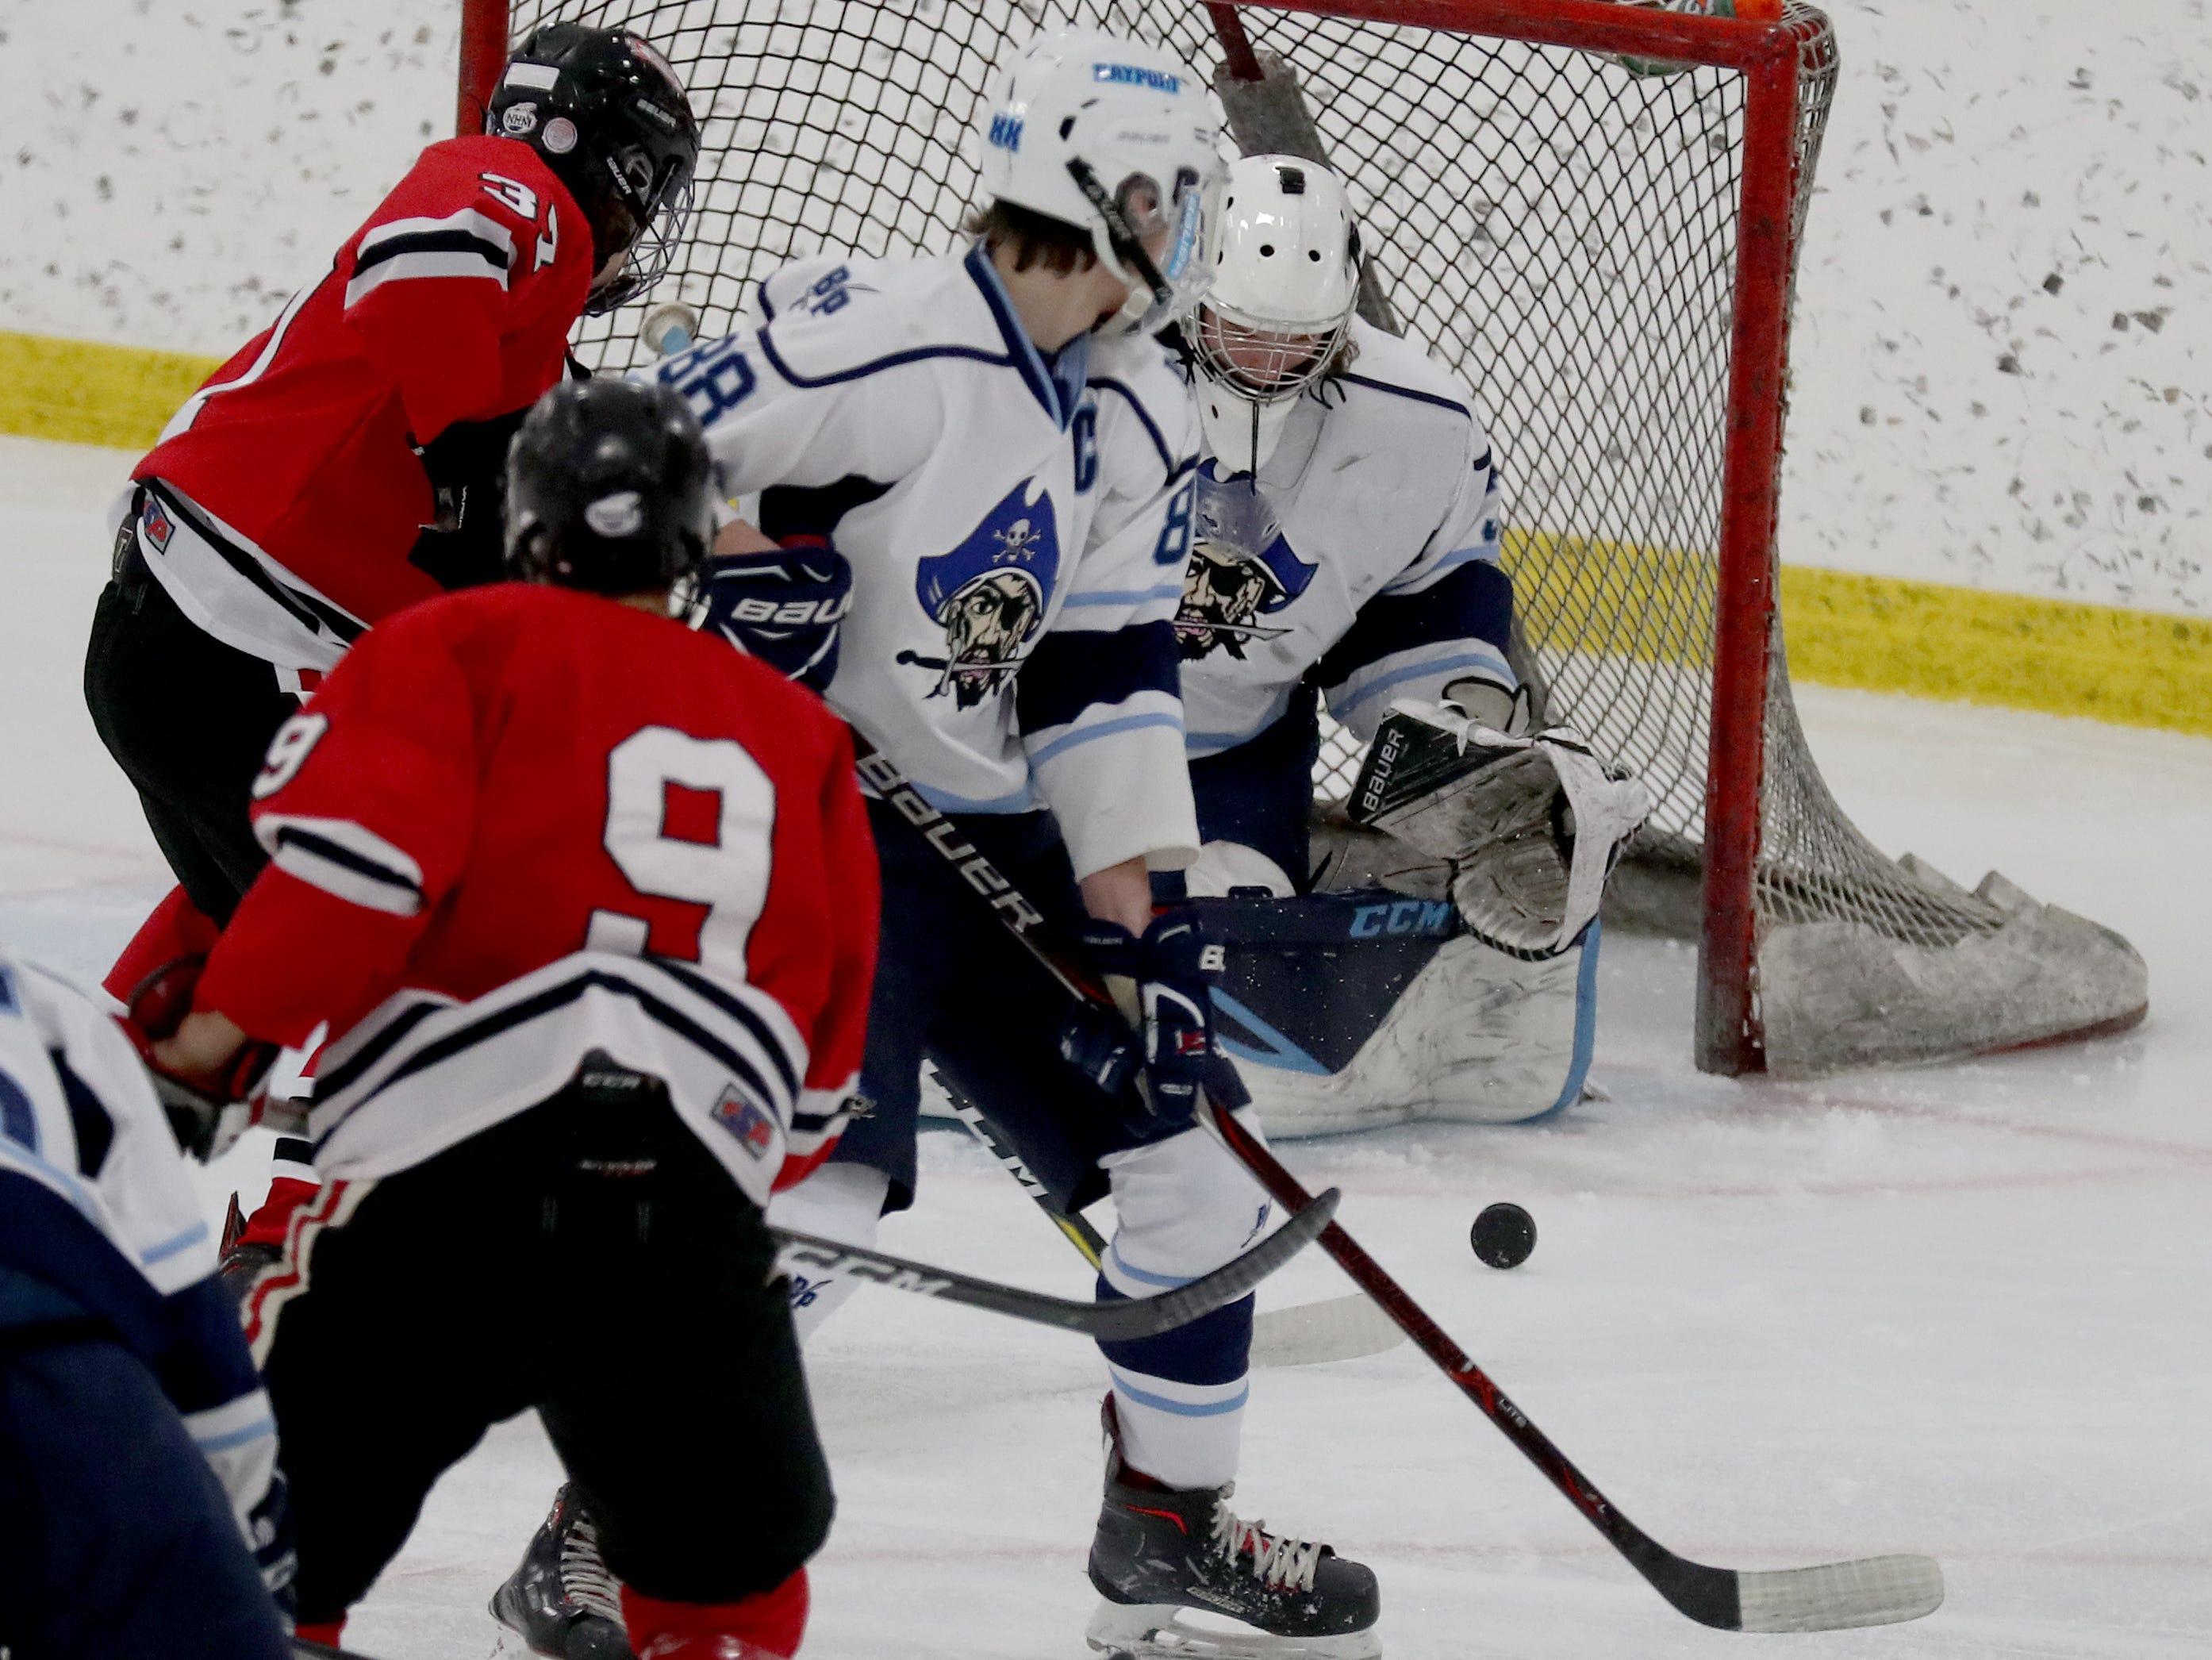 Bay Port goalie Kaden LeDocq stops a shot against Neenah-Hortonville-Menasha hockey Friday January 11, 2019 at Cornerstone Community Center in Ashwaubenon, Wis.